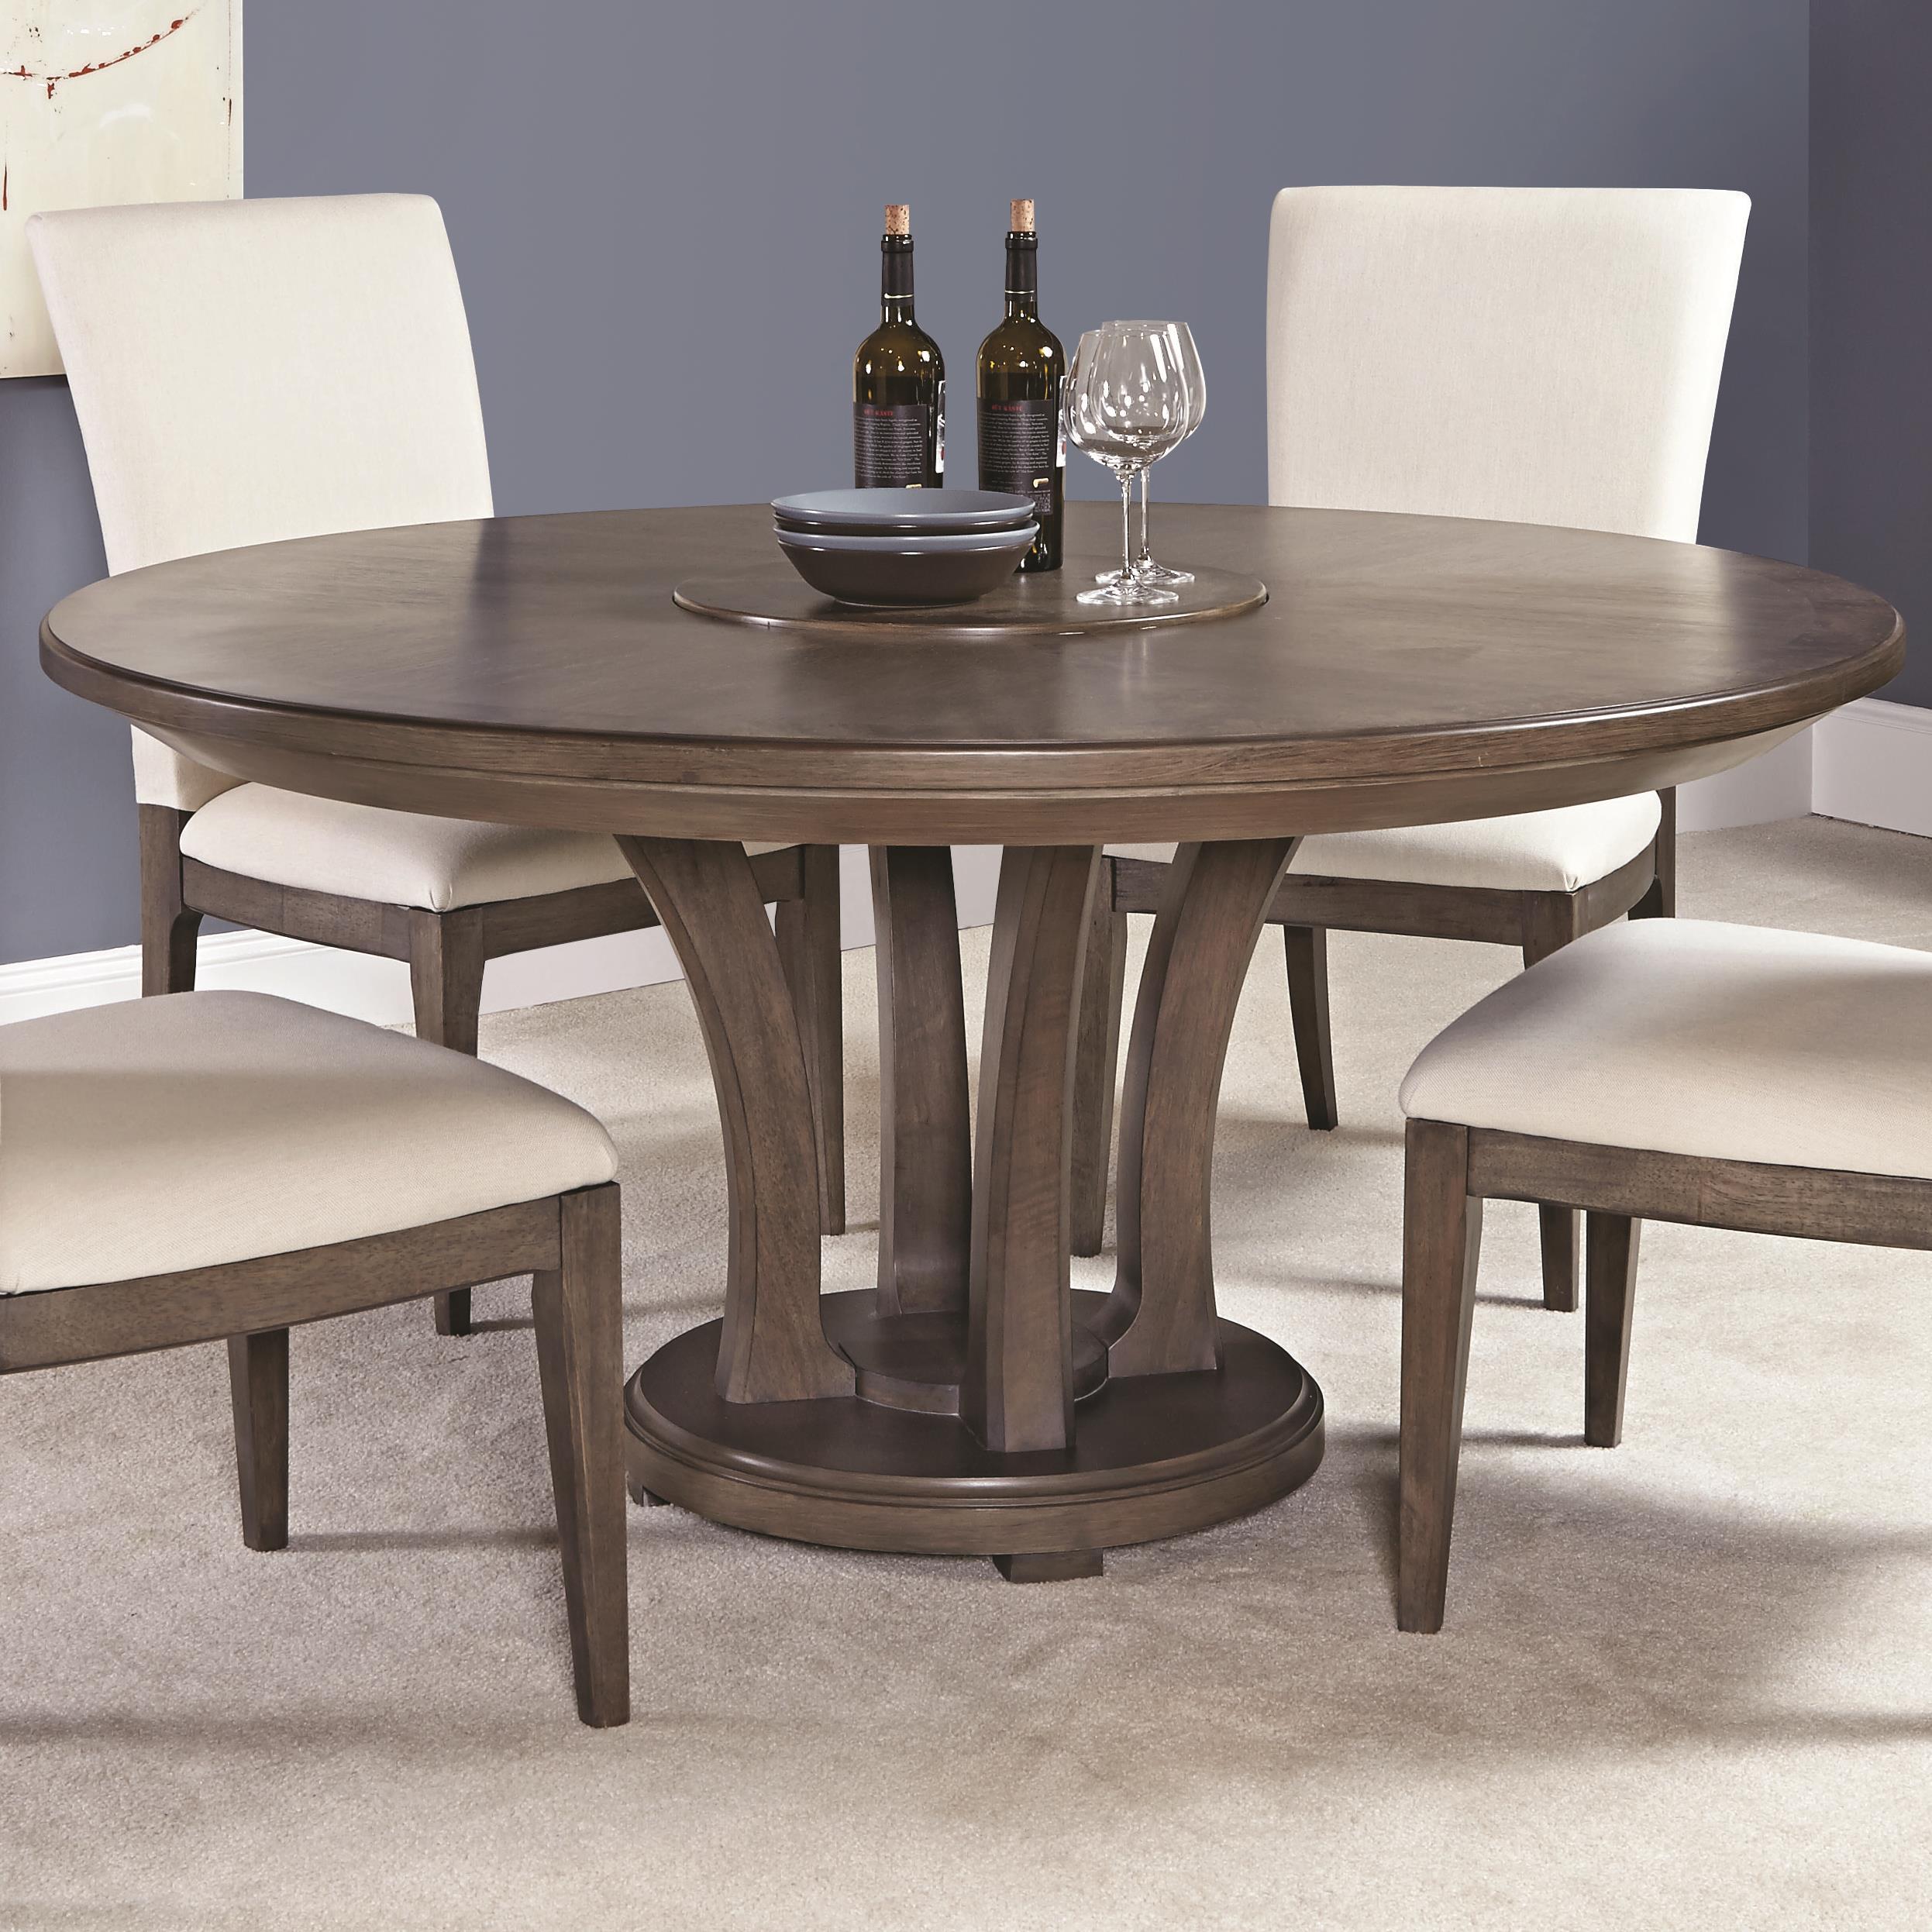 title   Modern kitchen table